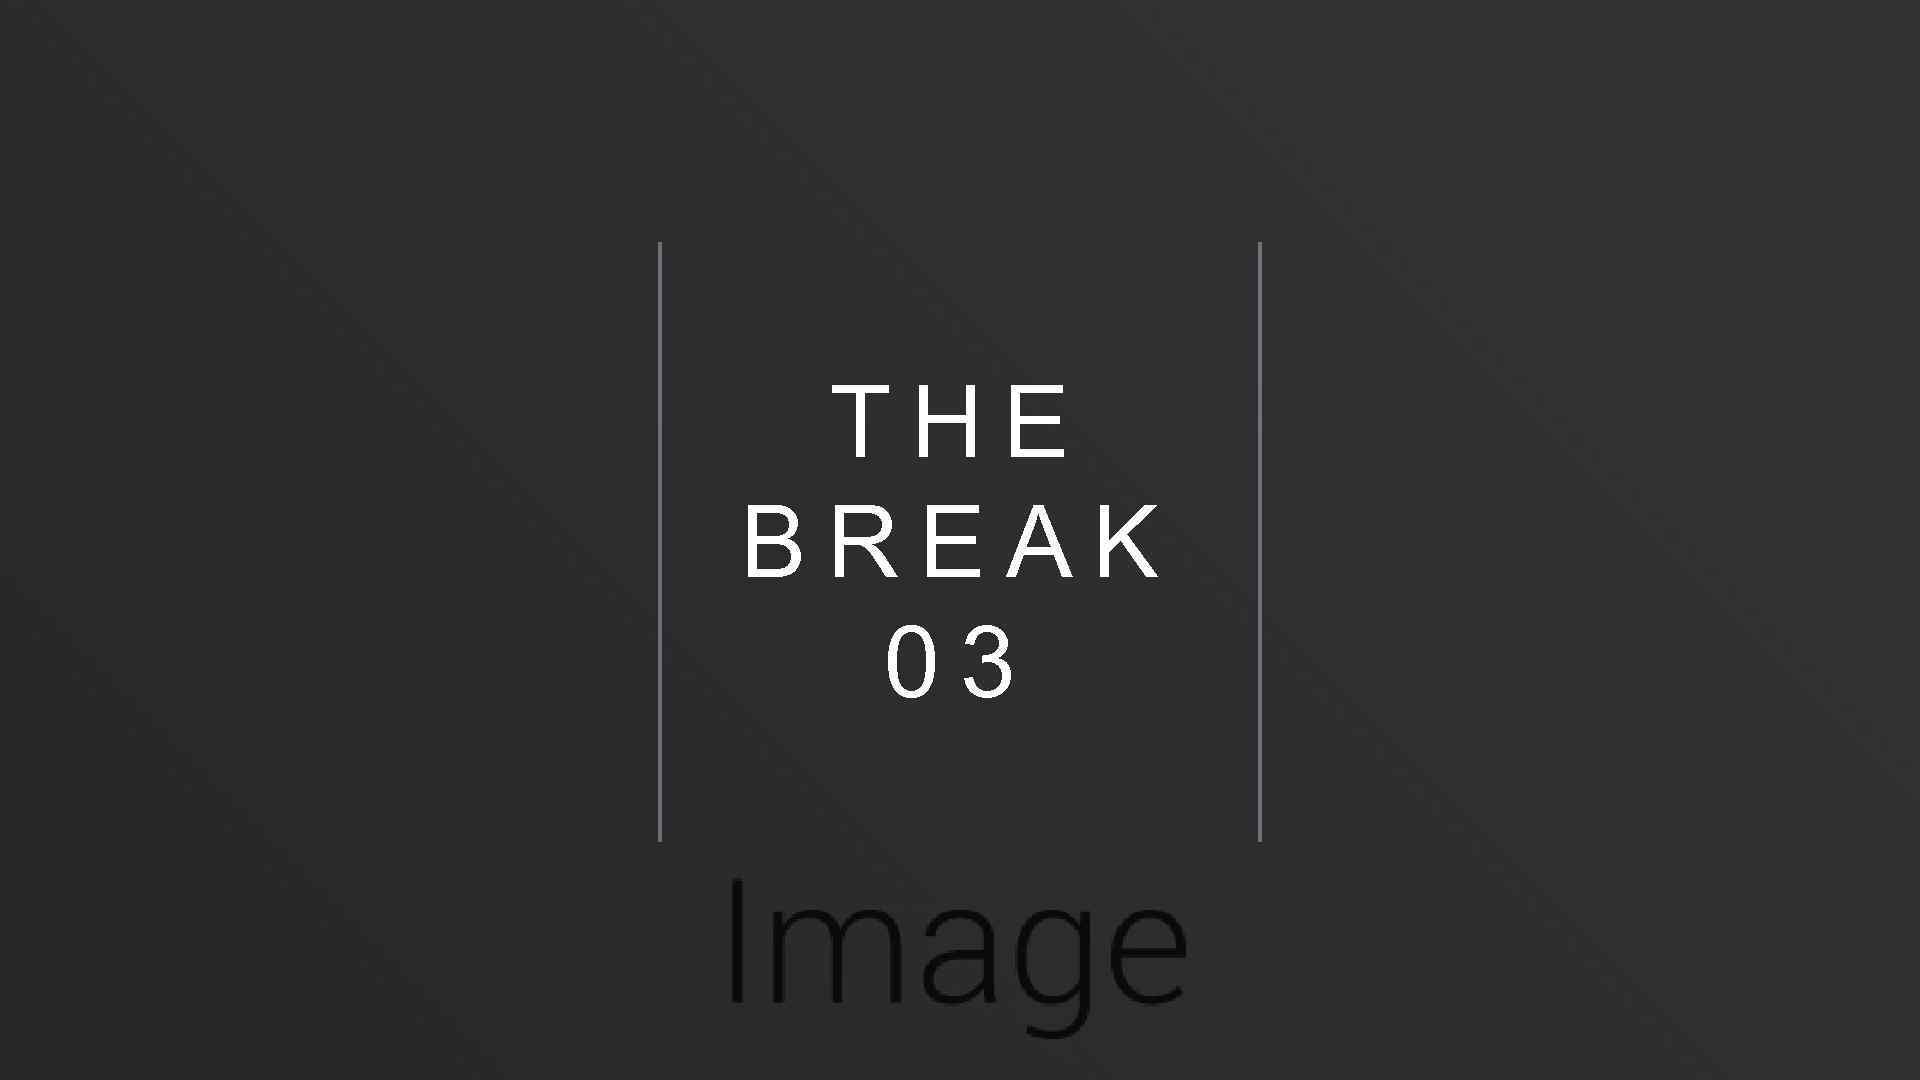 THE BREAK 03